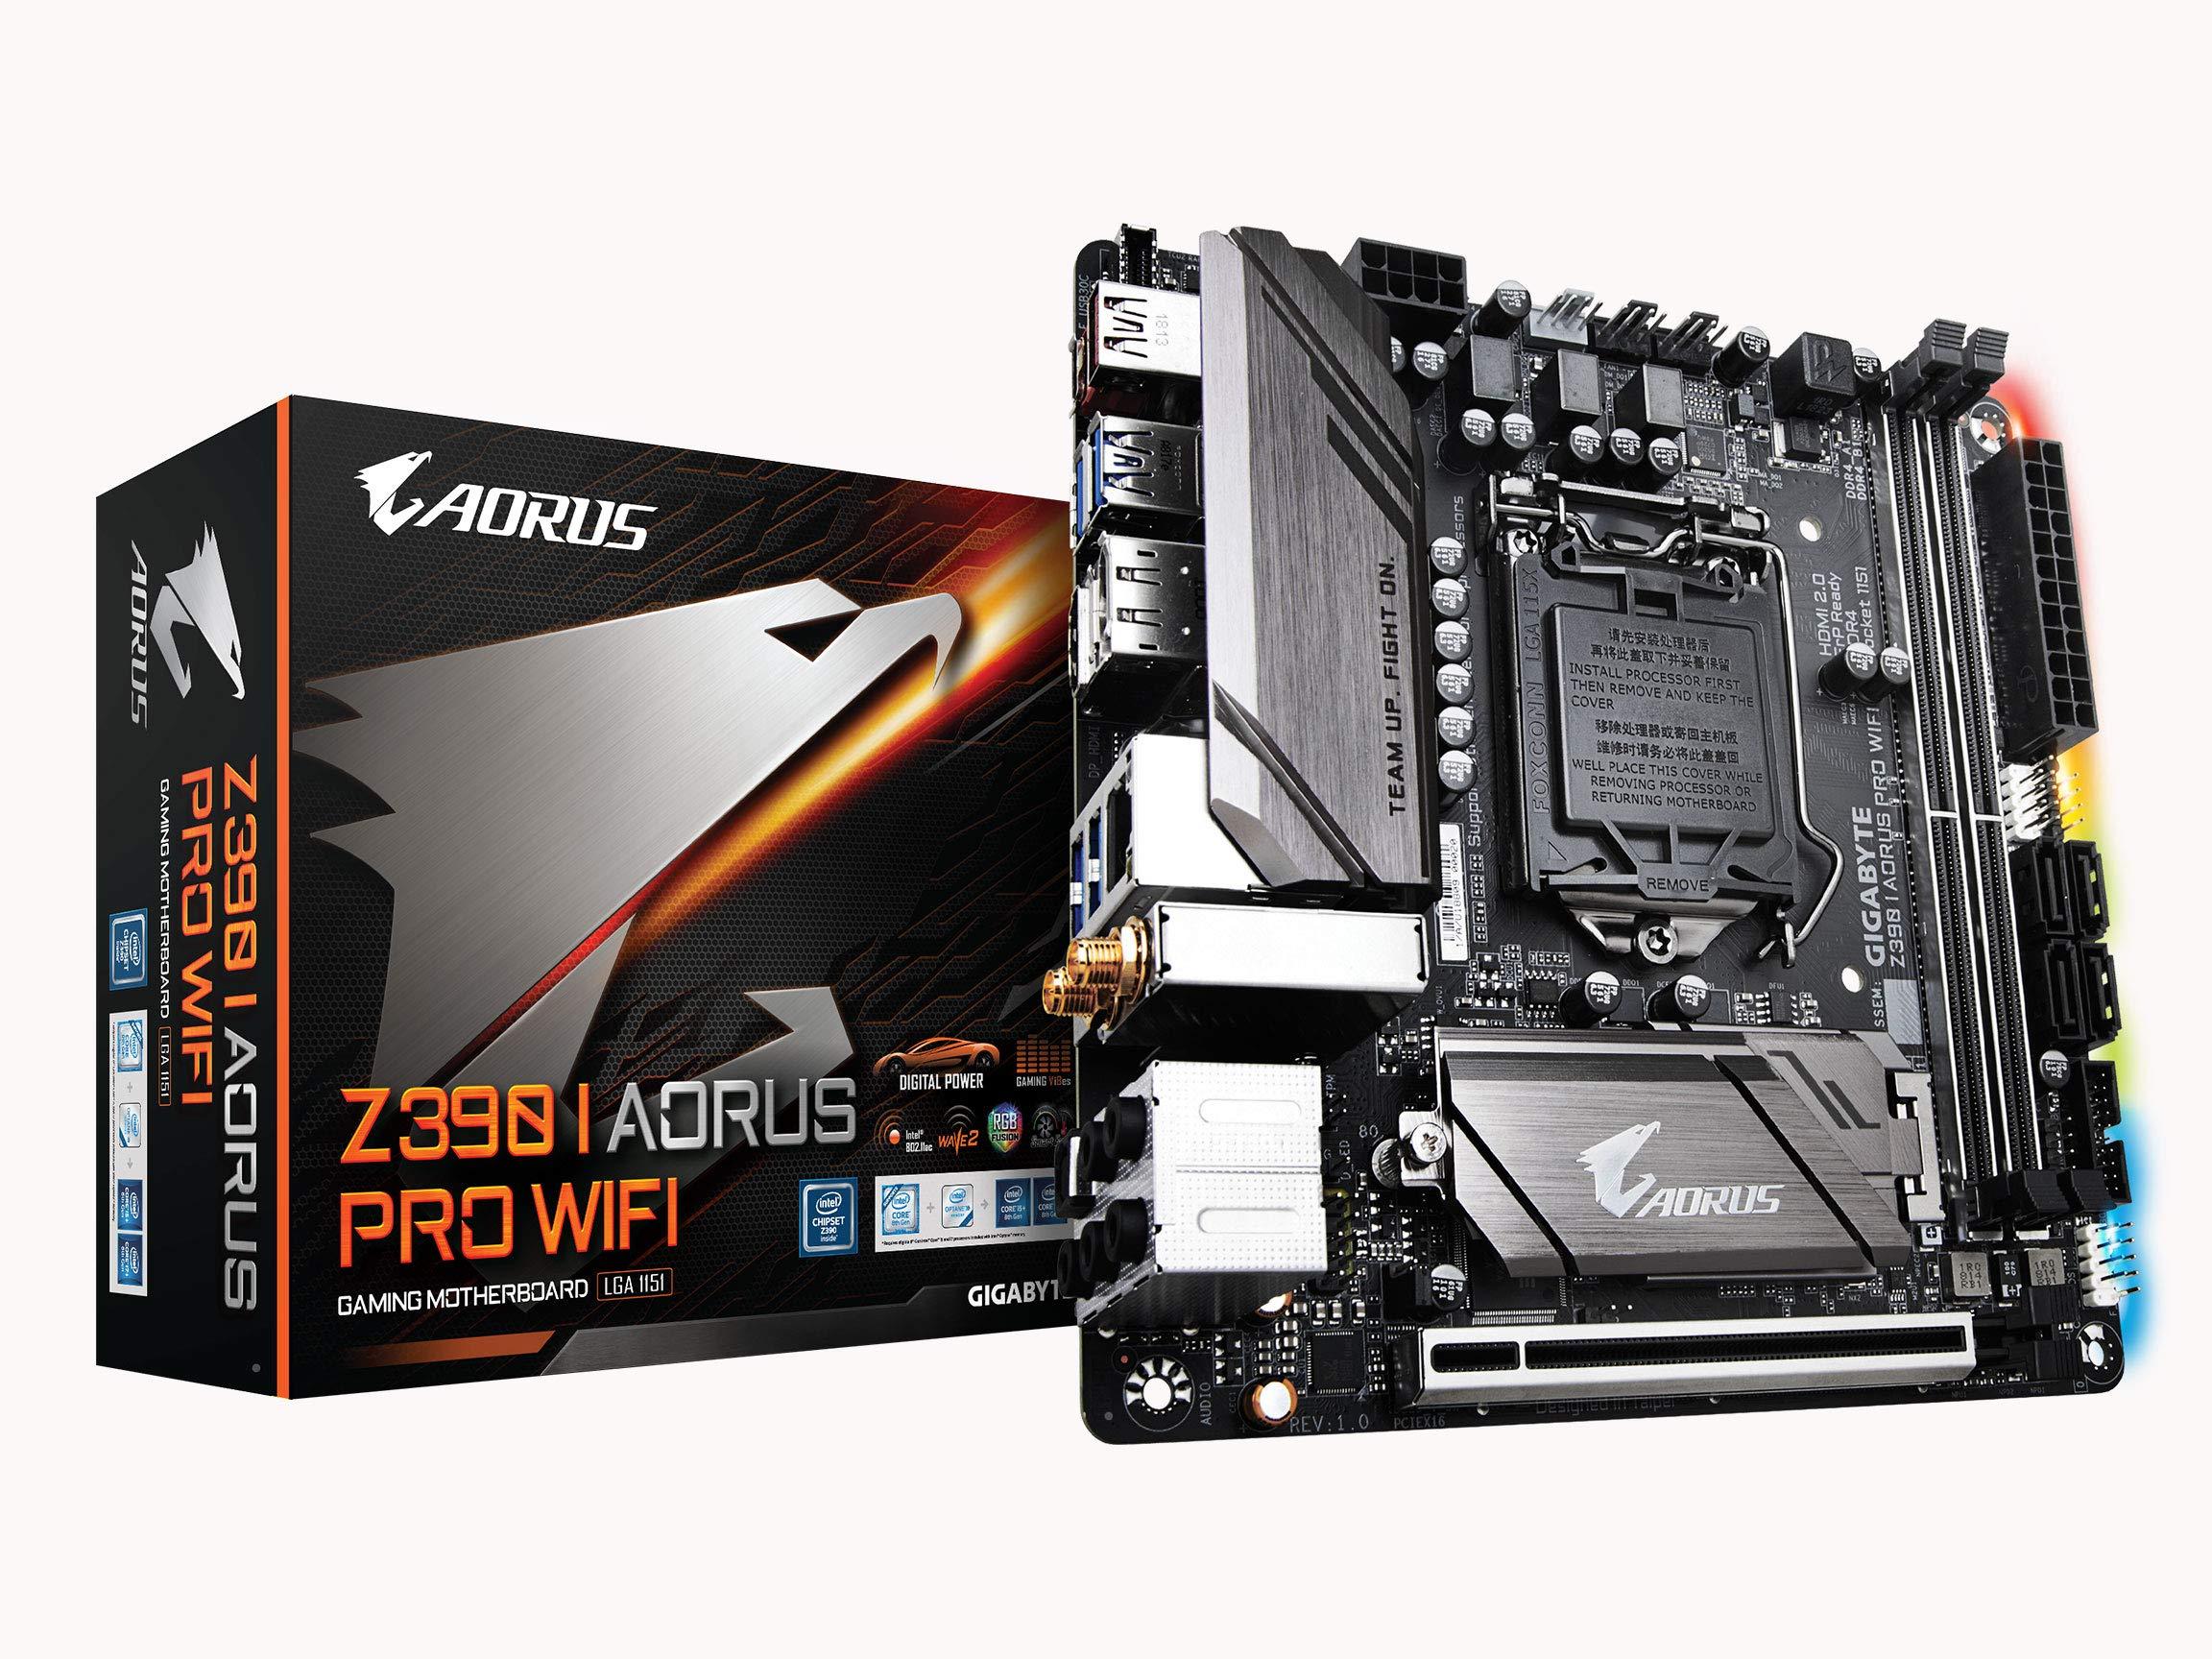 GIGABYTE Z390 I AORUS PRO WiFi (Intel LGA1151/Z390/Mini-ITX/M.2/Realtek ALC1220-VB/Intel GbE LAN/HDMI/Motherboards)